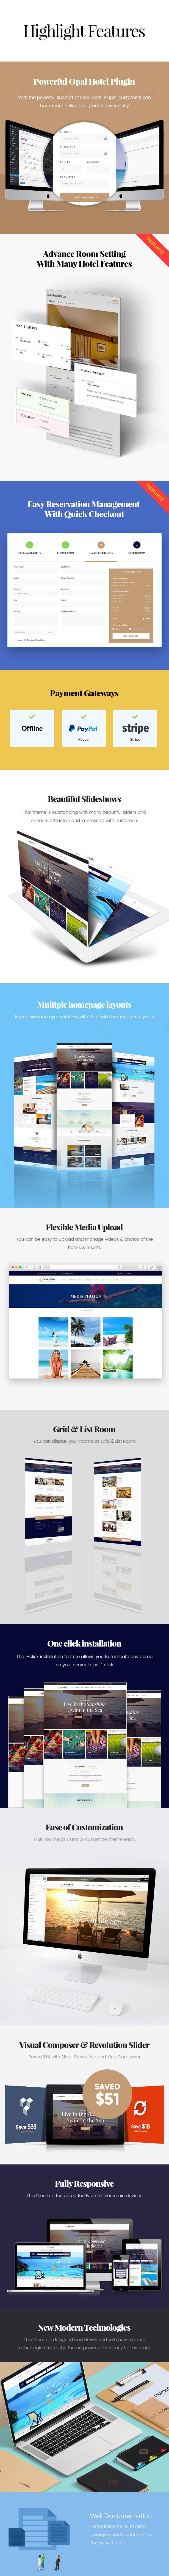 Paradise - Hotel & Resort Responsive WordPress Theme - 9